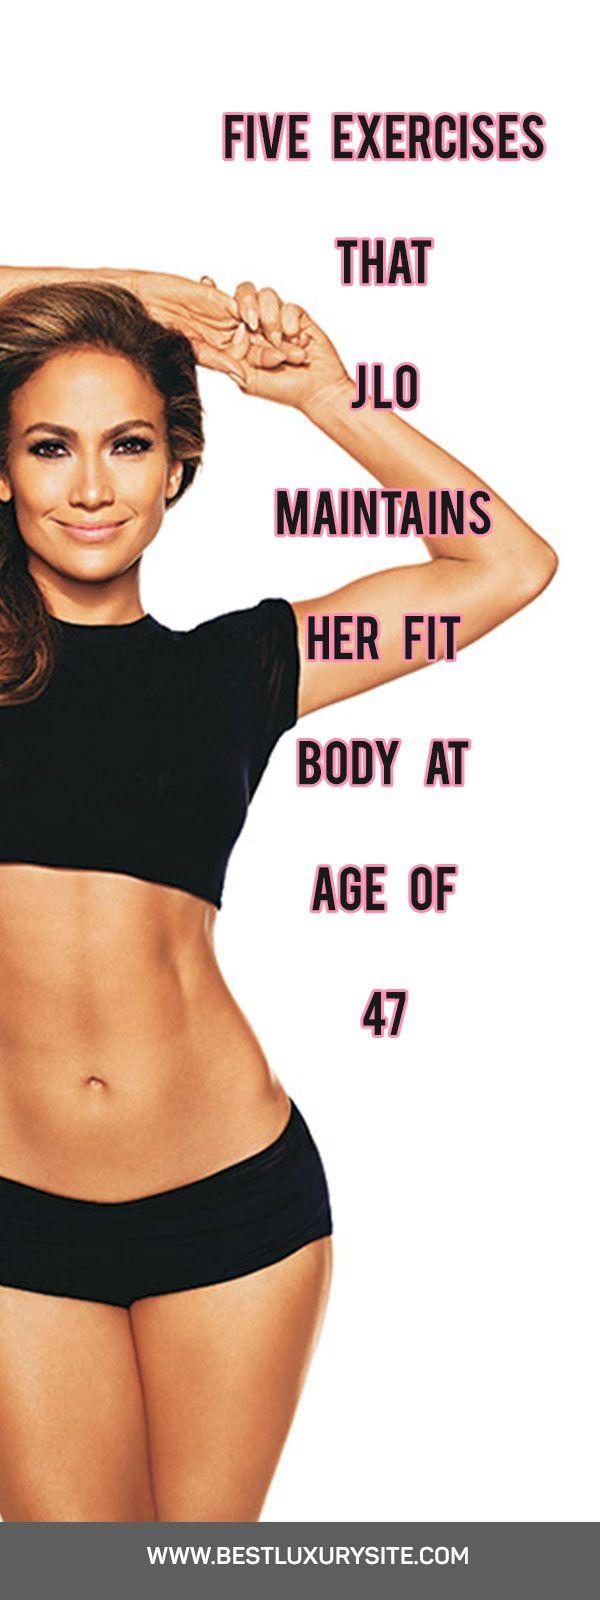 Jennifer Lopez looks incredibly fit, wanna know her secret???